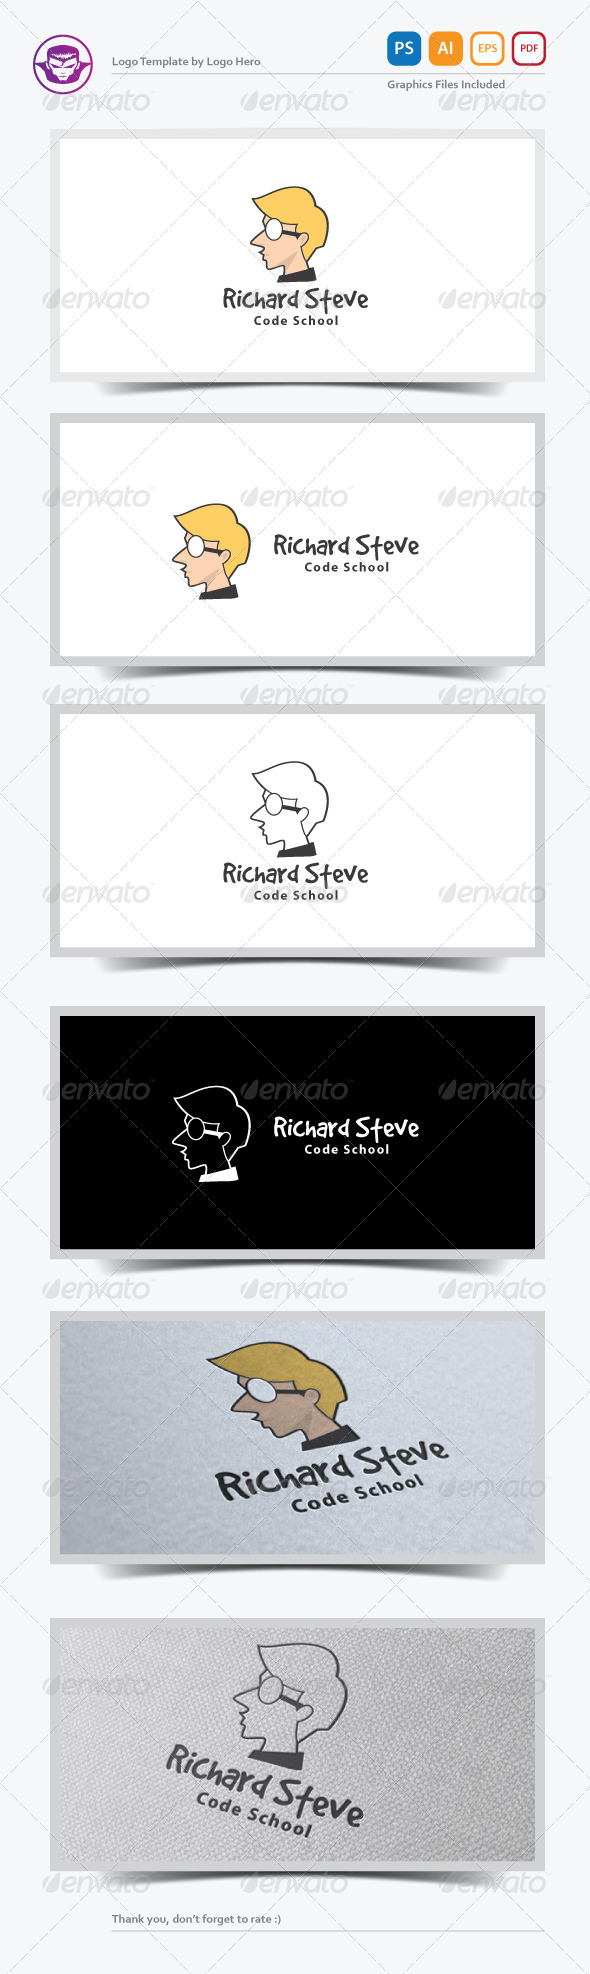 GraphicRiver Personal Brand Logo Template 7029260